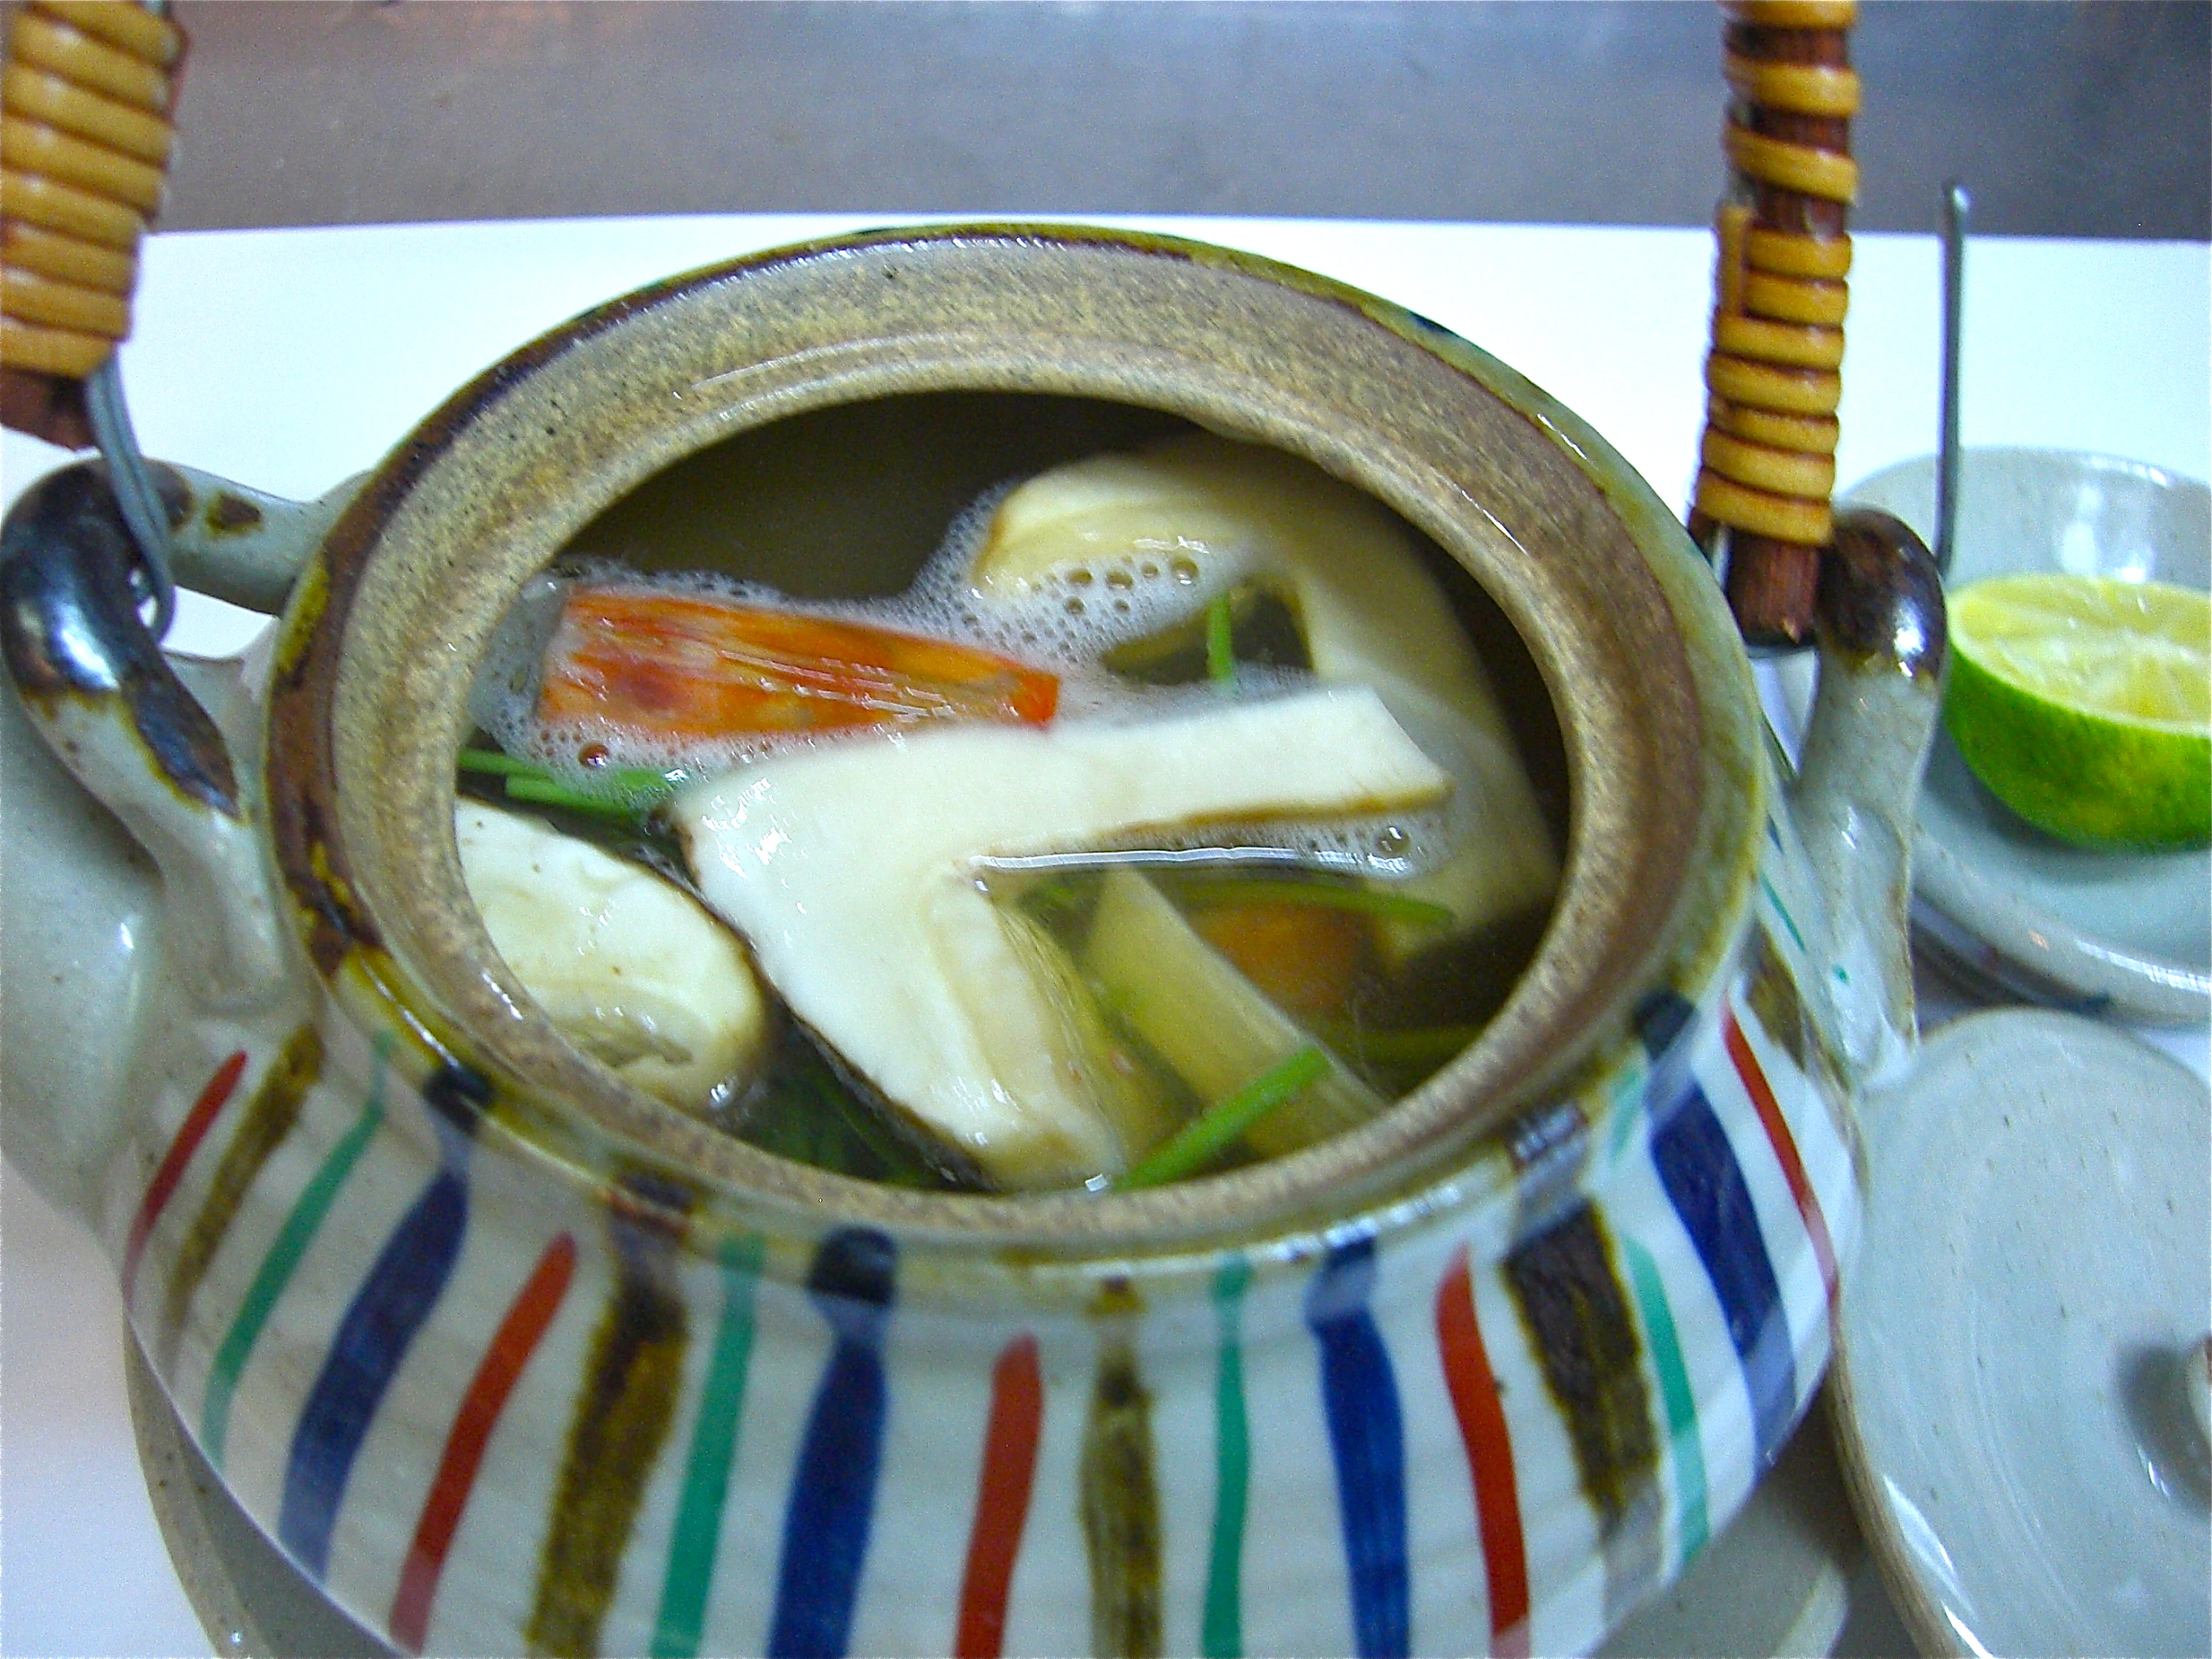 松茸土瓶蒸し(松茸料理1)